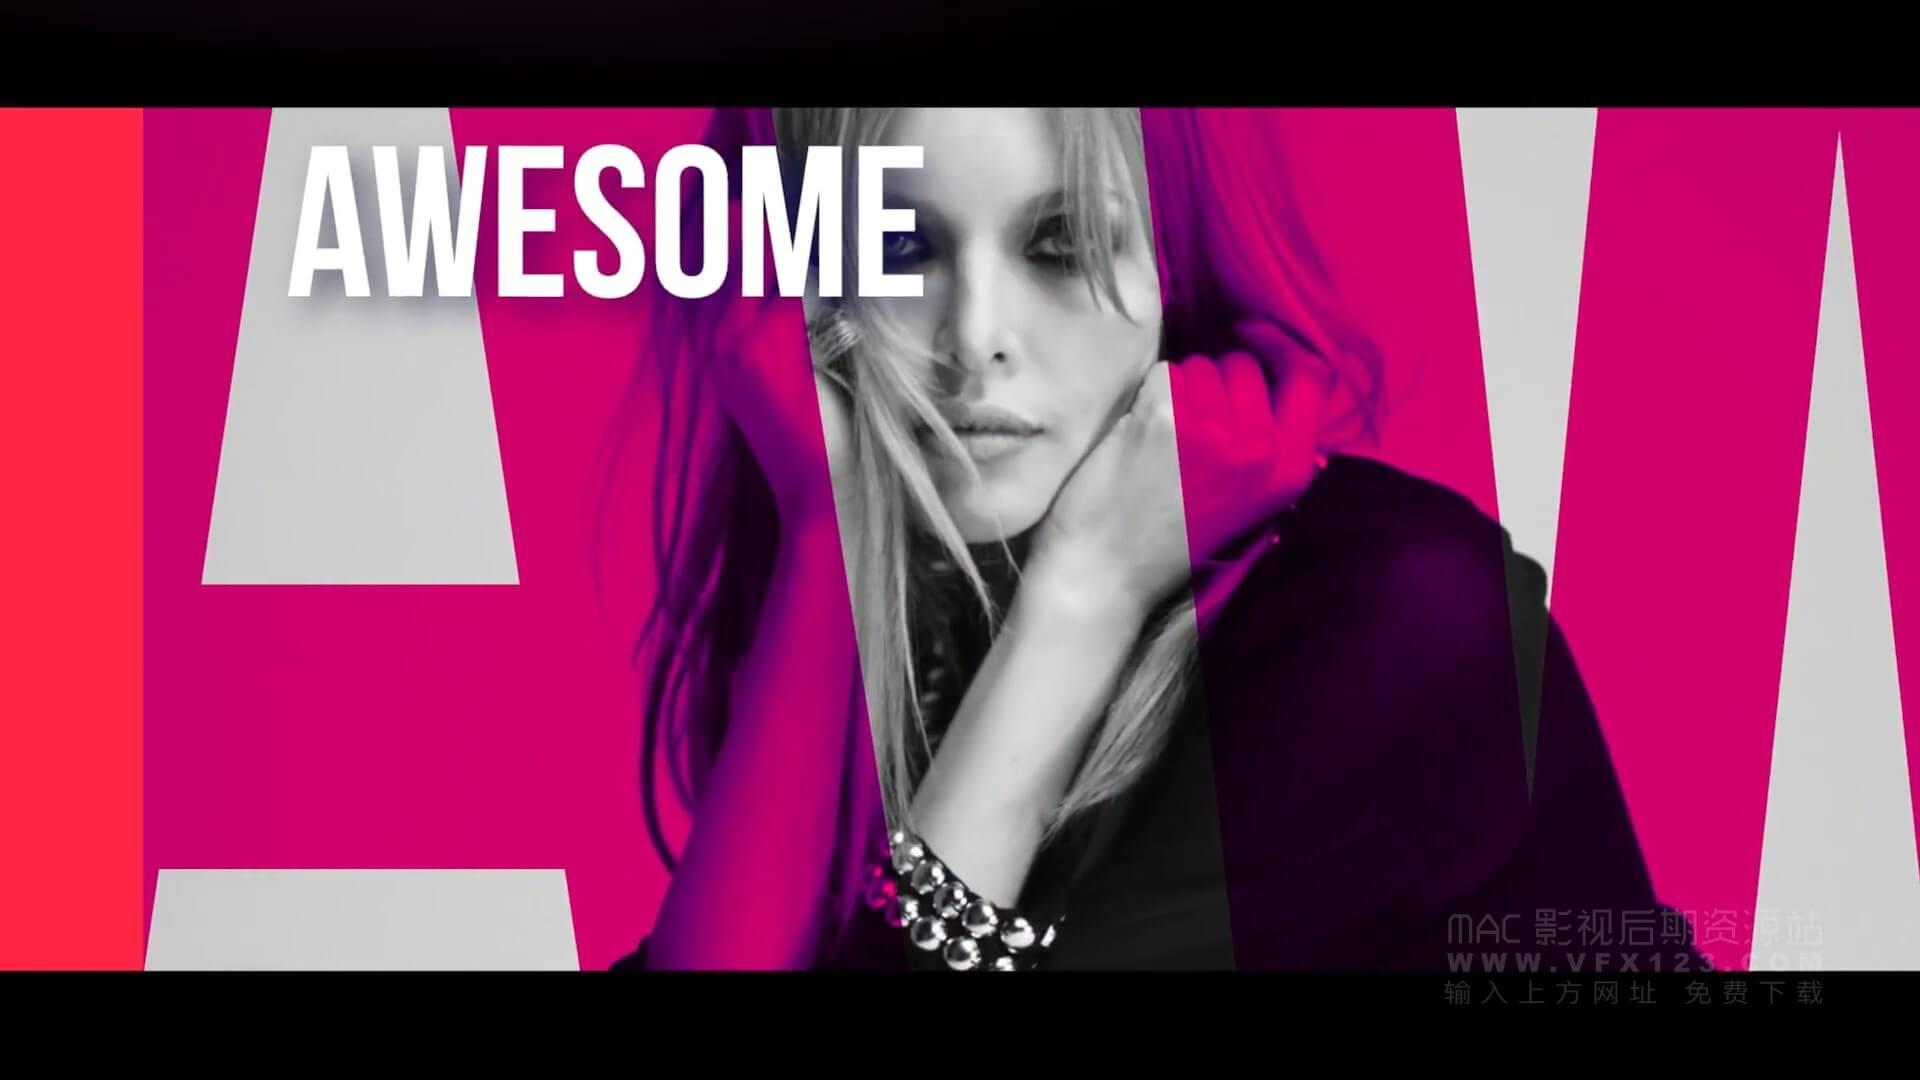 Fcpx主题模板 现代流行写真图文展示 motion模板 Fashion Opener | MAC影视后期资源站